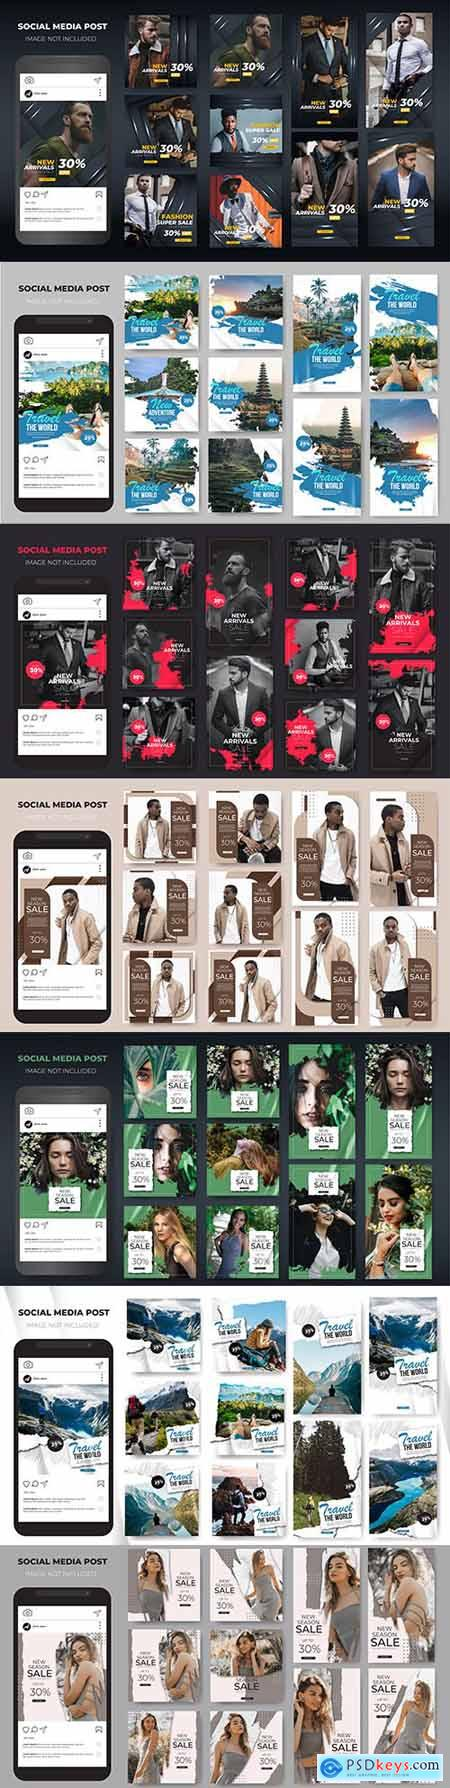 Social media stories Instagram template sale fashion